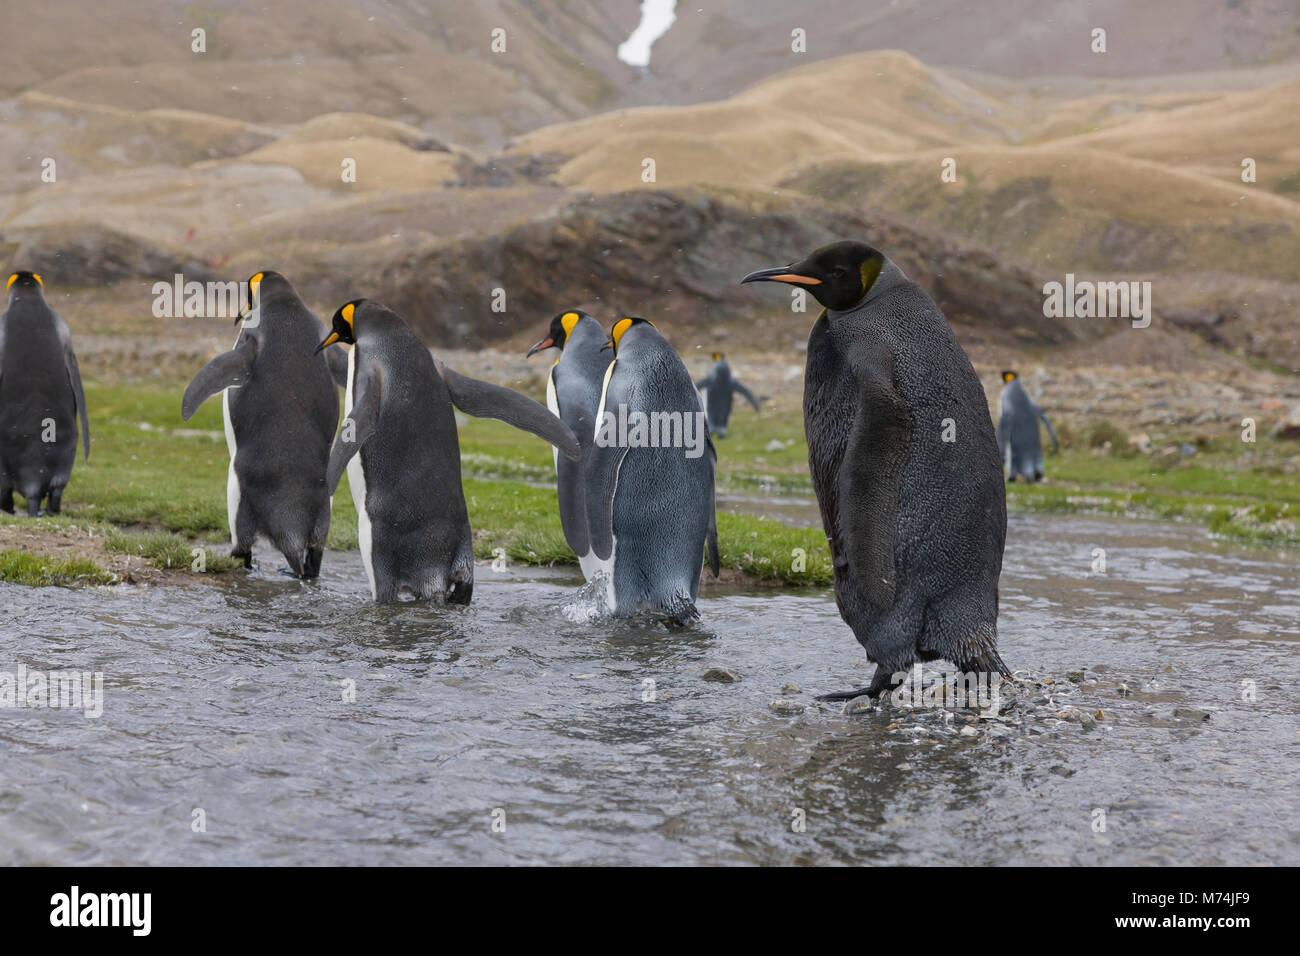 Rare black king penguin, Aptenodytes patagonicus close up, eye contact with genetic mutation melanism, at Fortuna - Stock Image